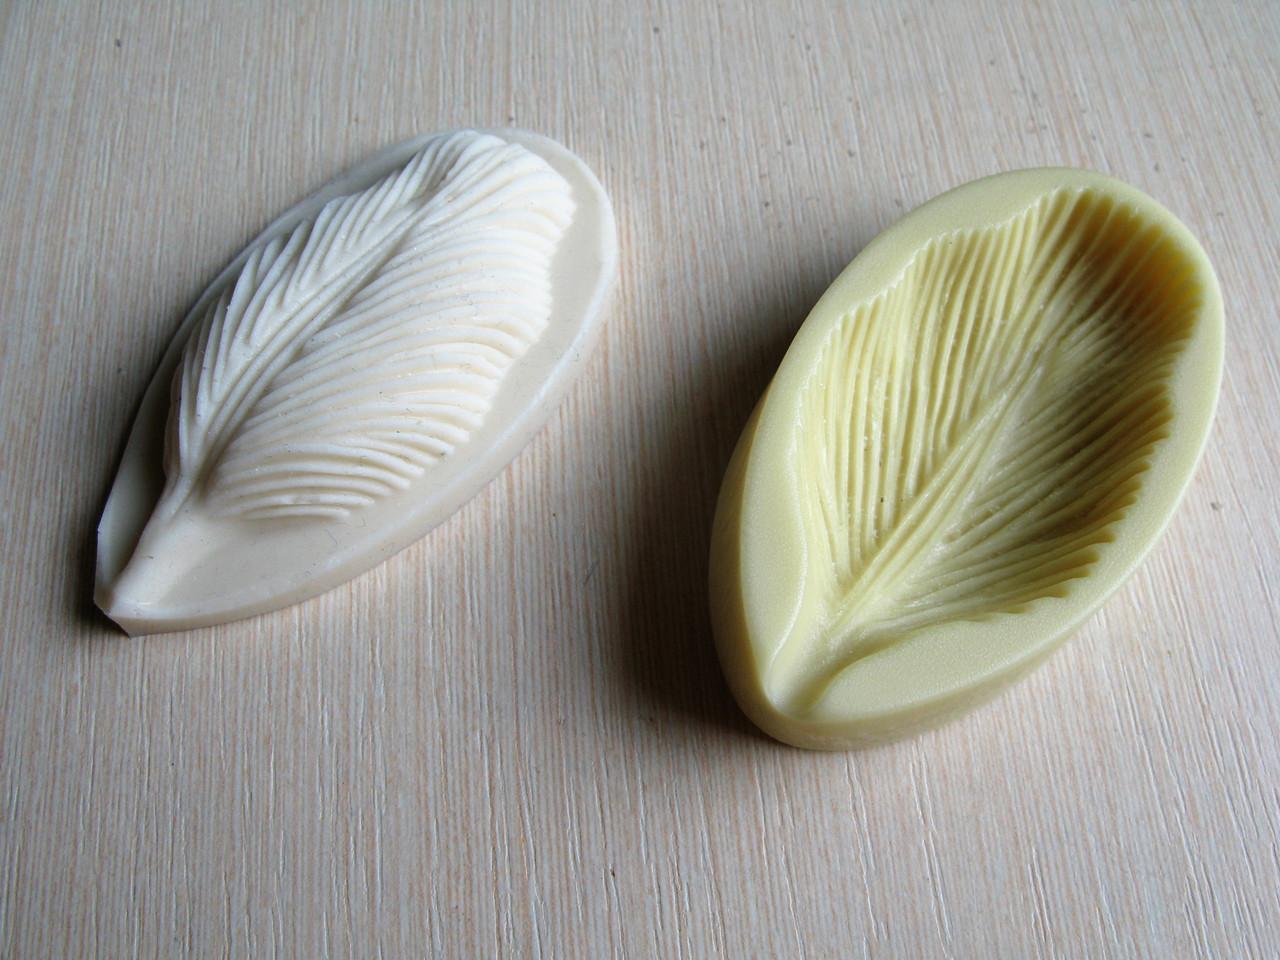 Лепесток тюльпан большой 4.5 на 8 см